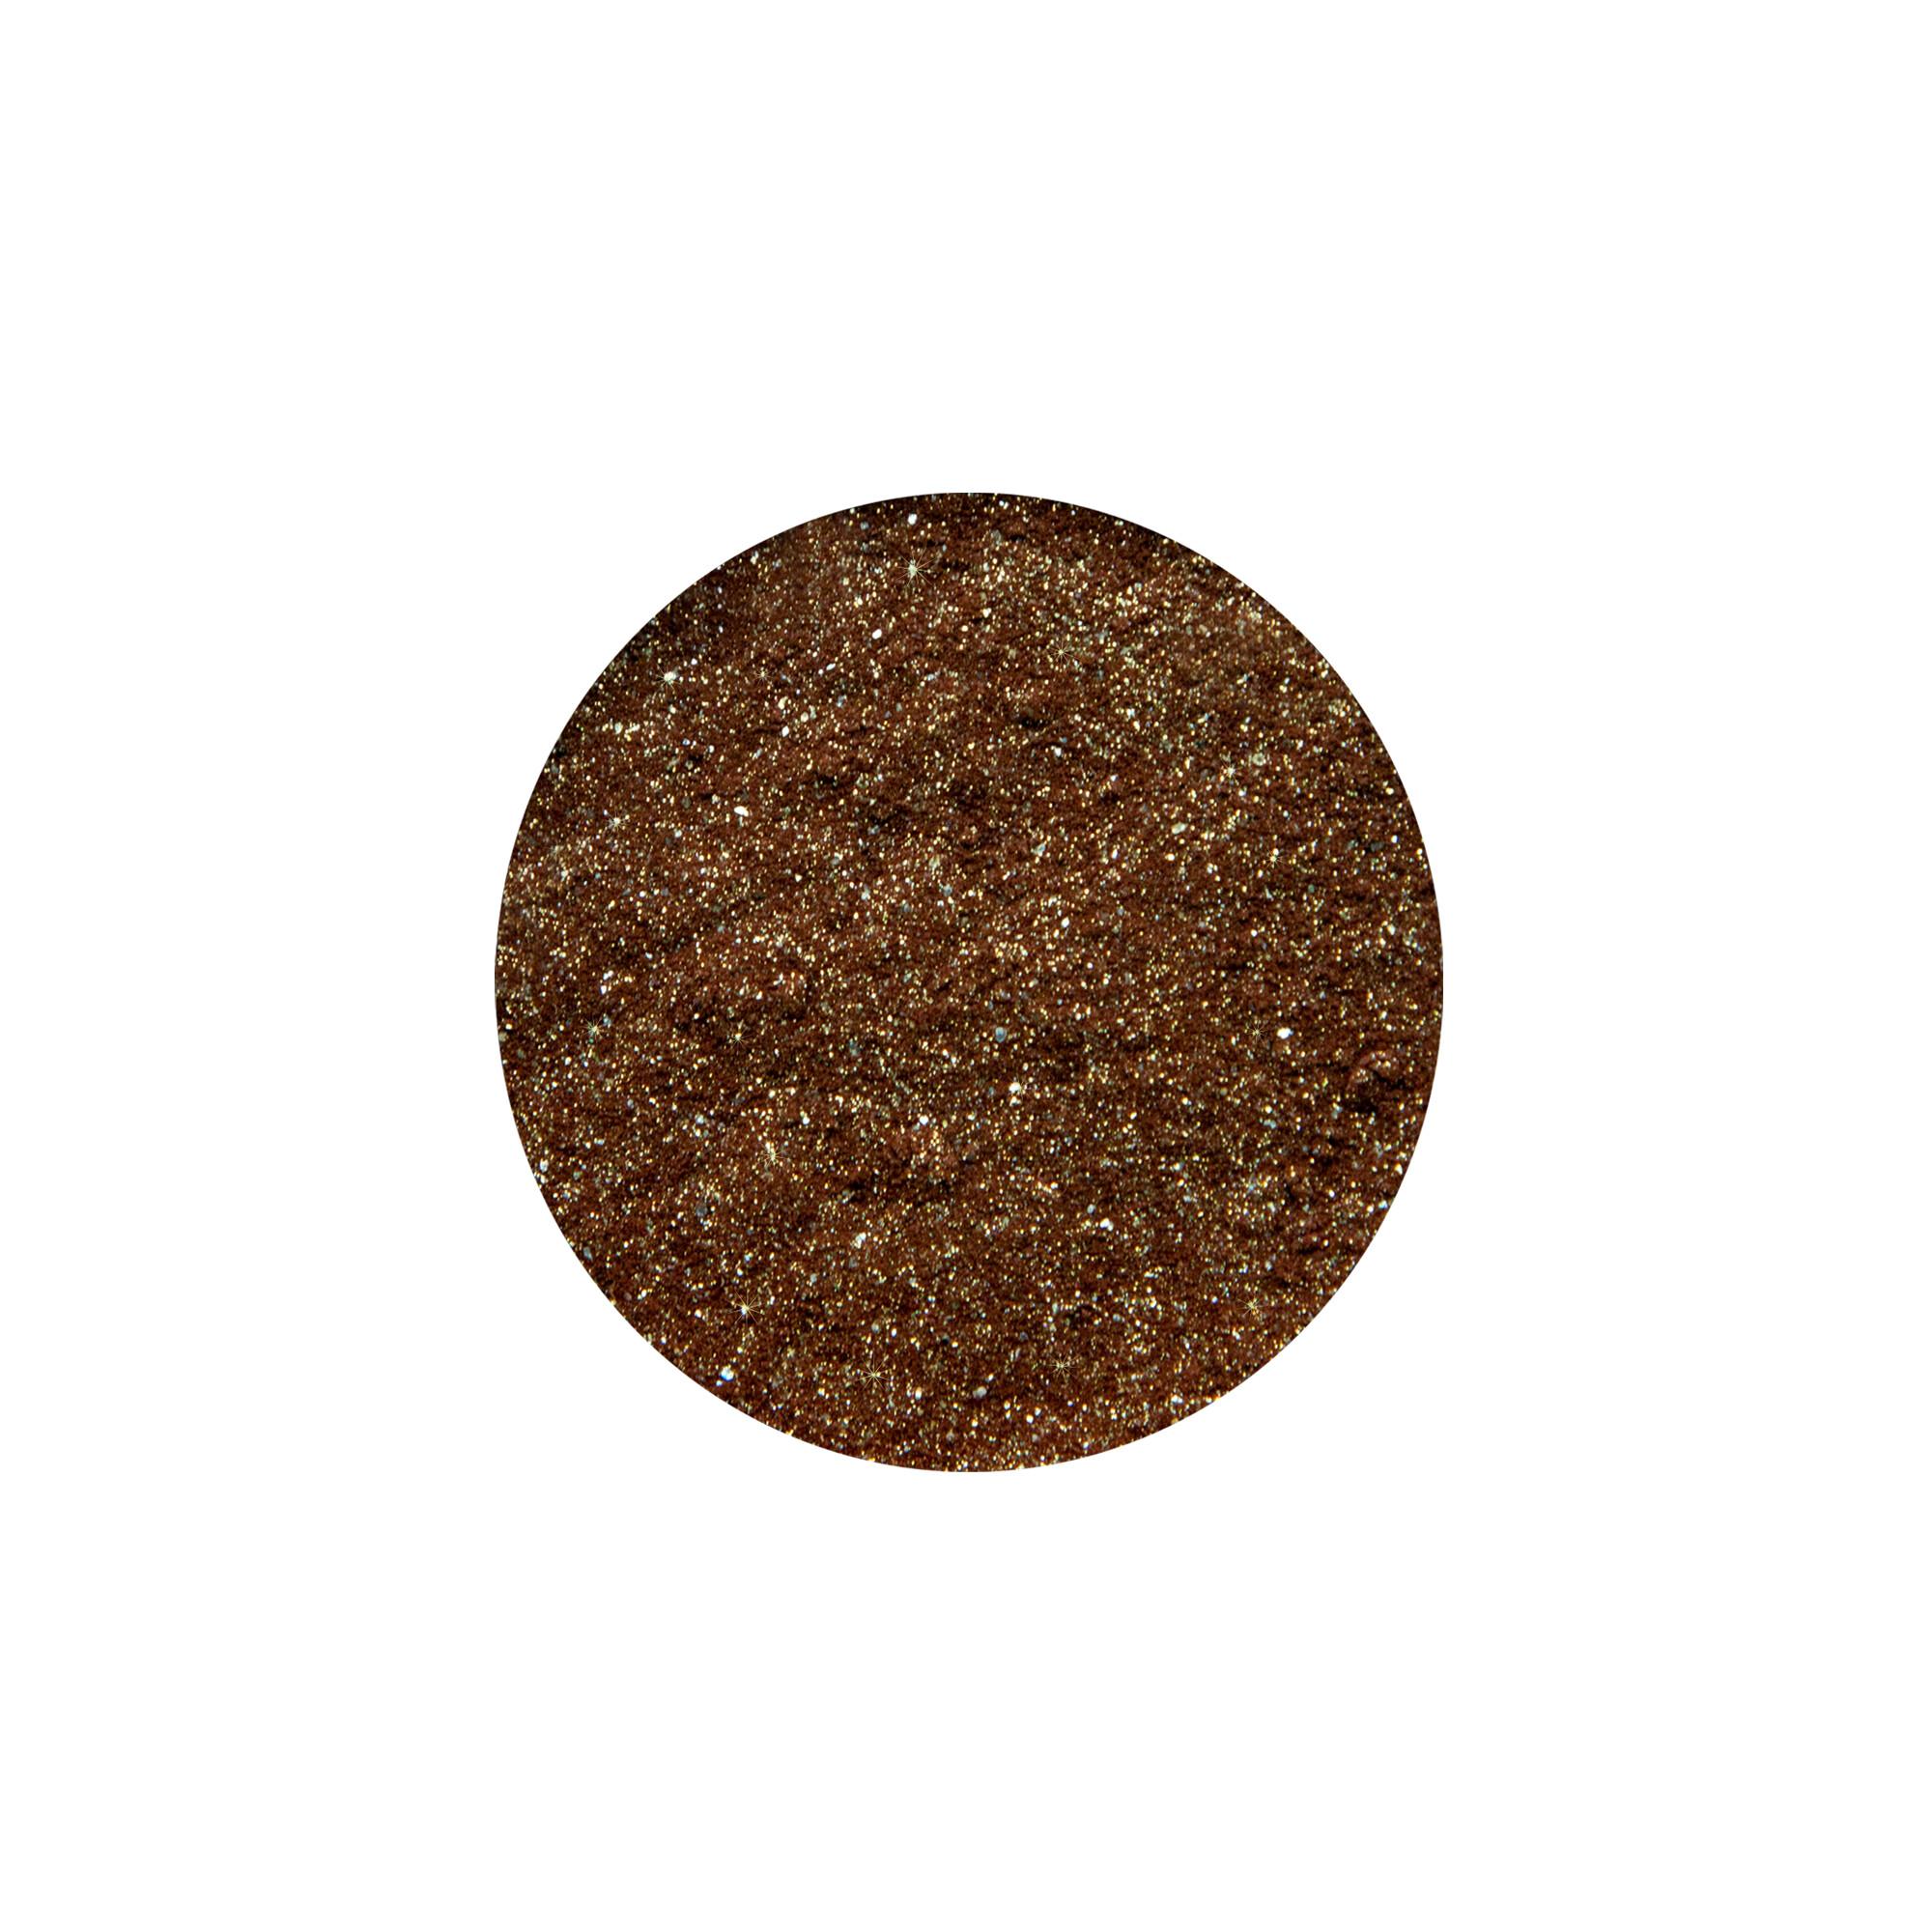 Essbarer Streudekor - Diamond Dust Kakao